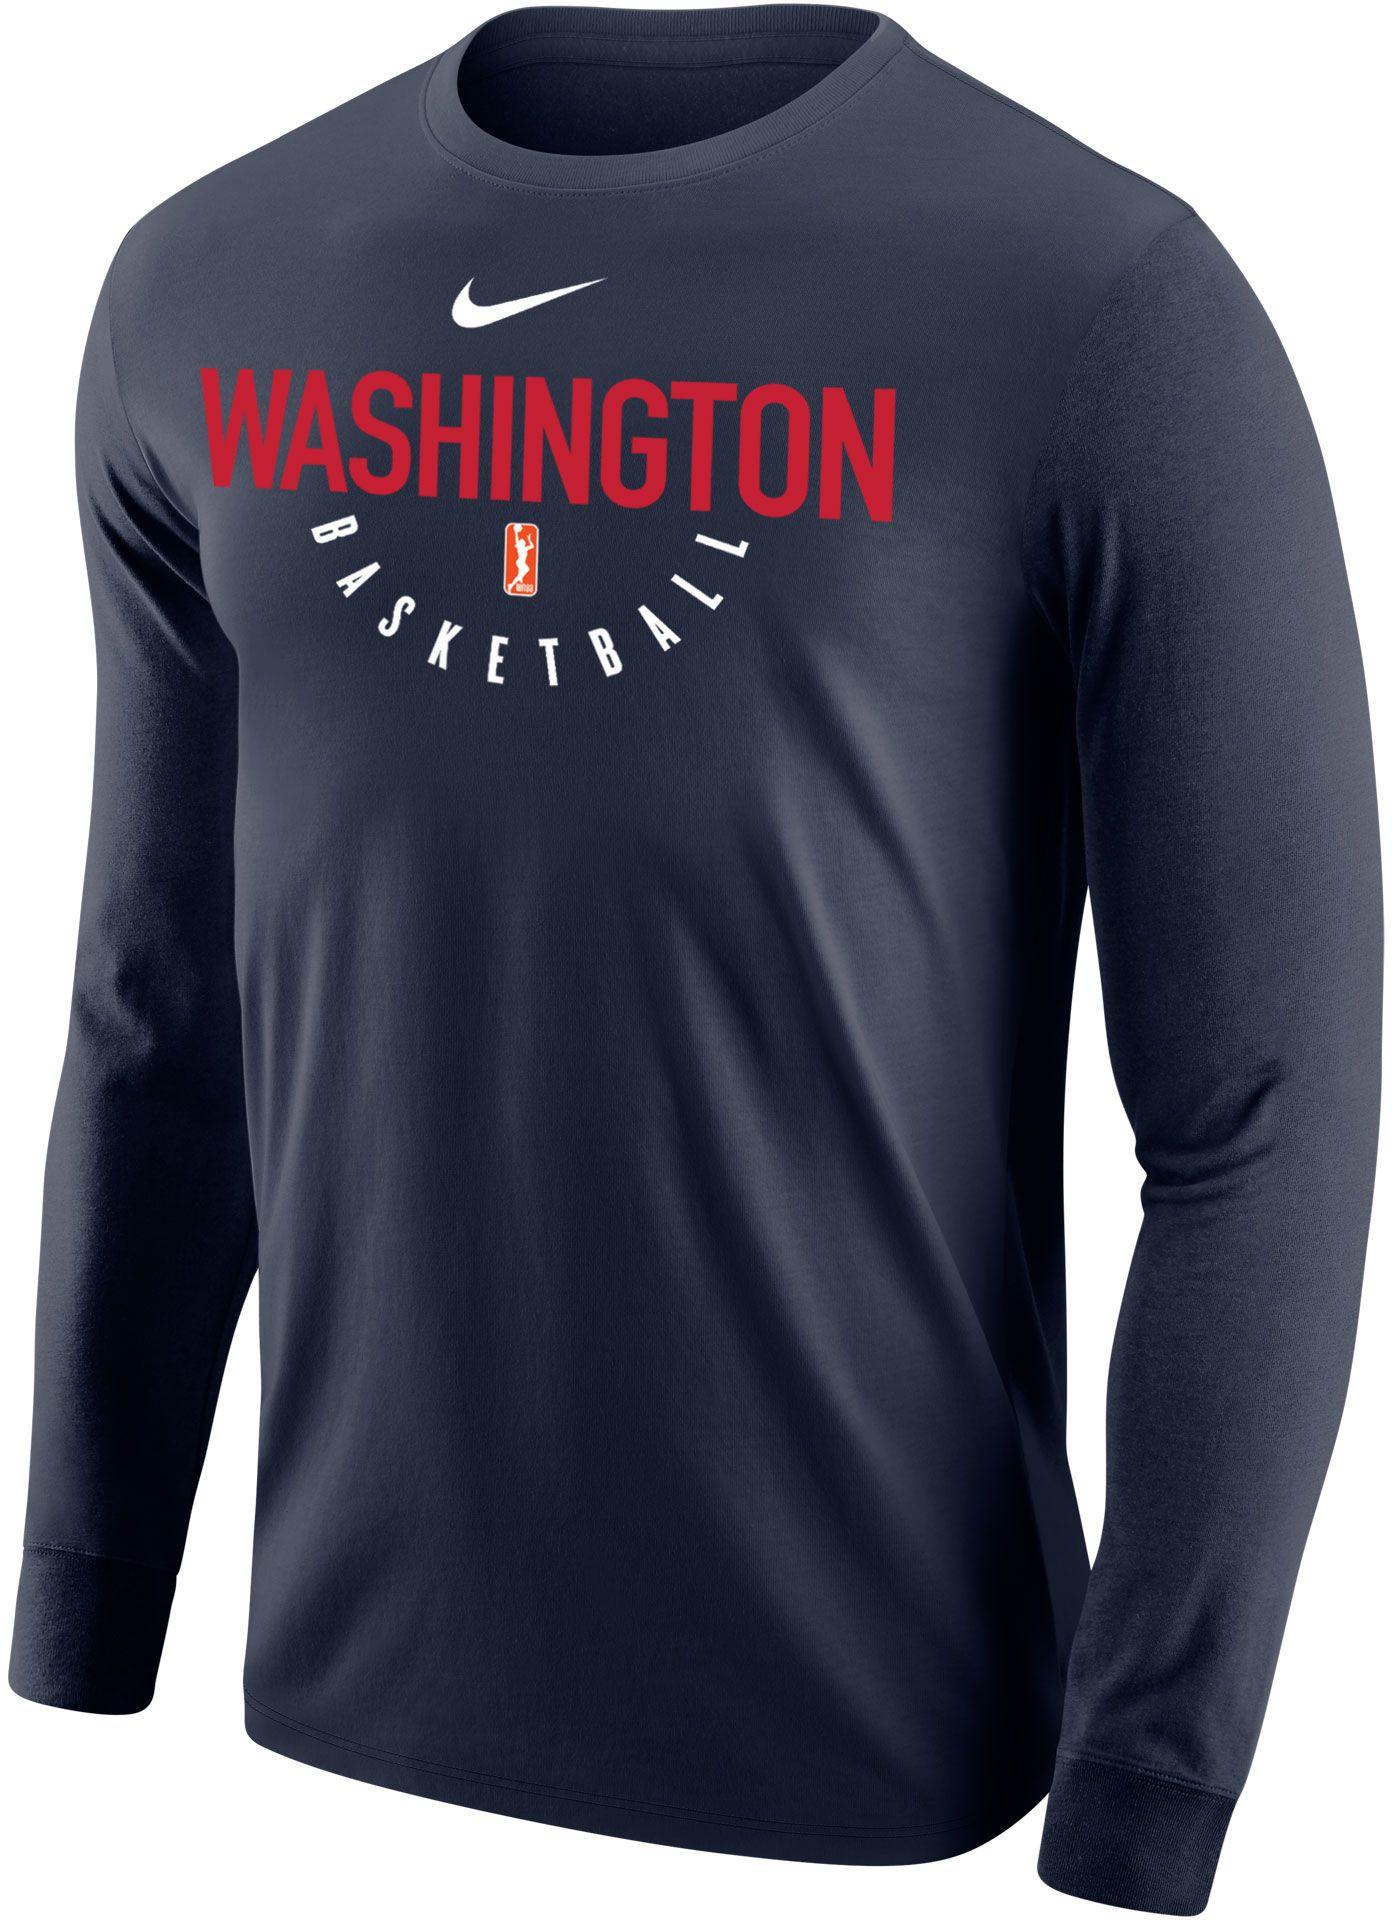 Nike Adult Washington Mystics Dri-FIT Navy Long Sleeve Shirt